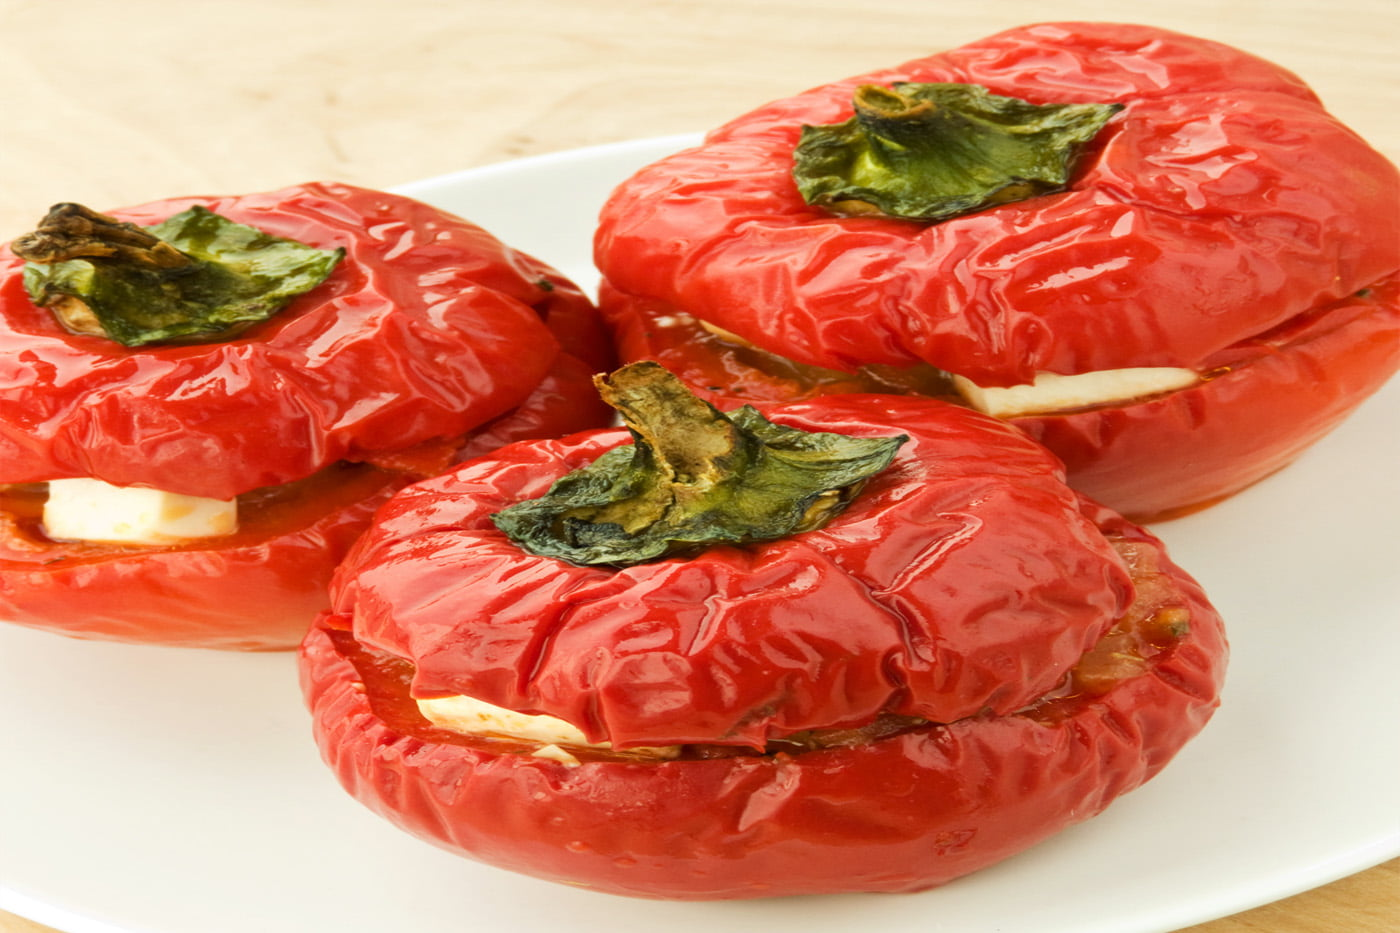 Vegetarian Feta & Shallot Stuffed Peppers